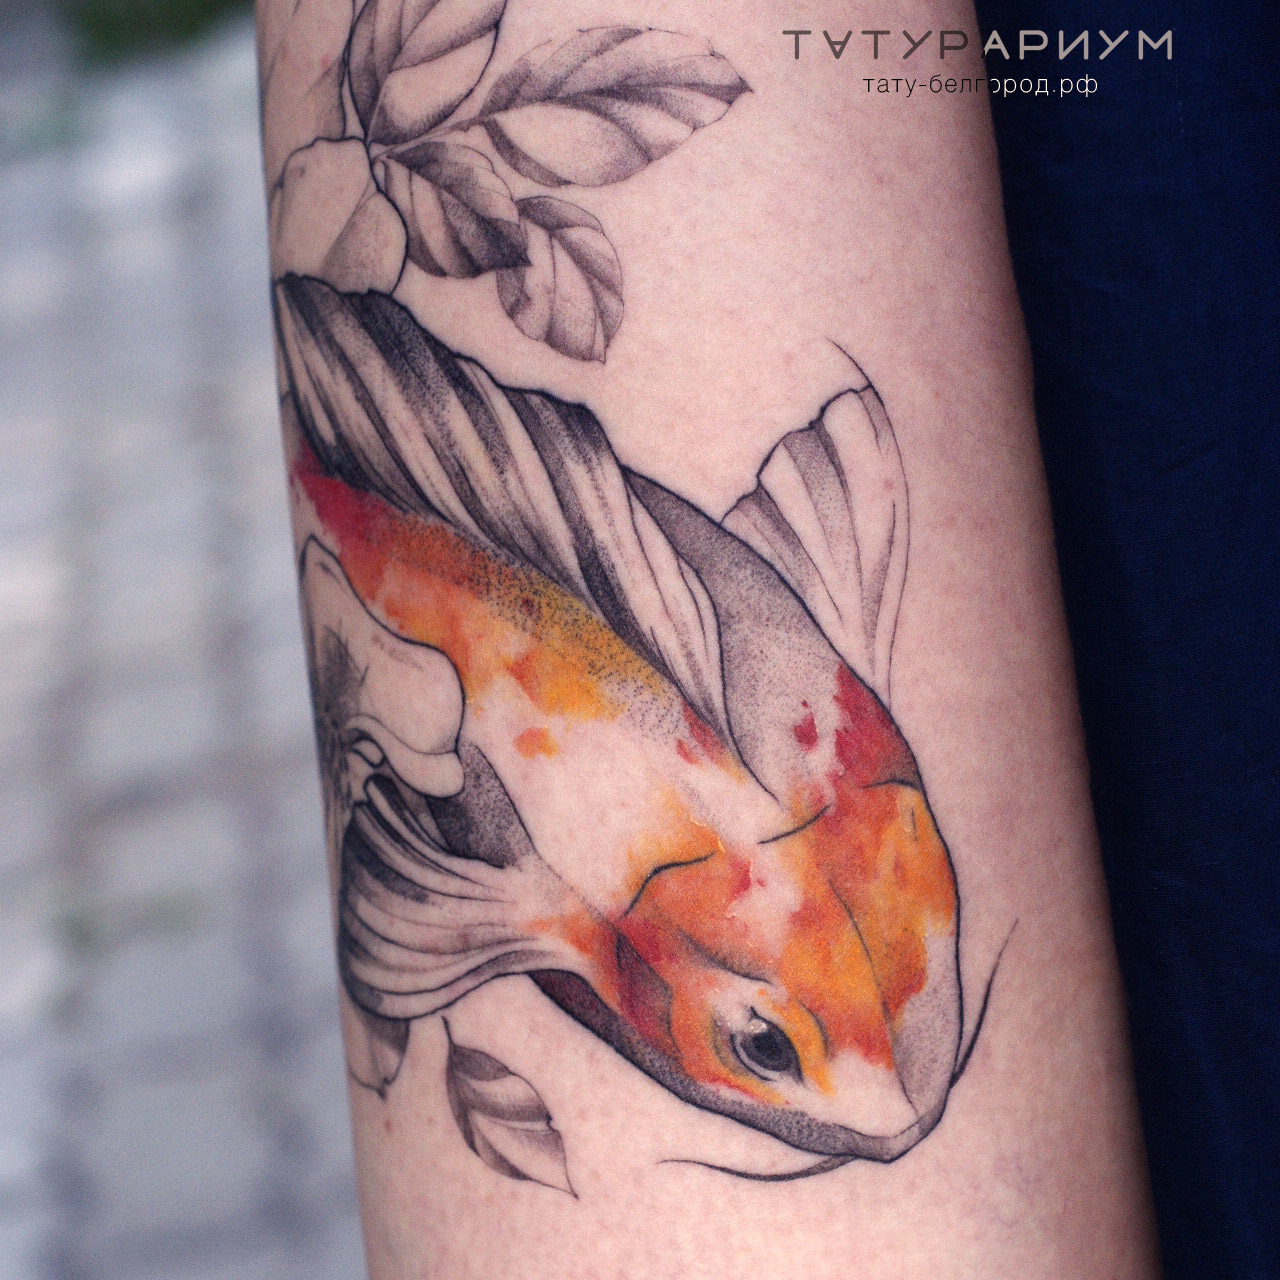 татуировка карпа, в стиле графика, на пл